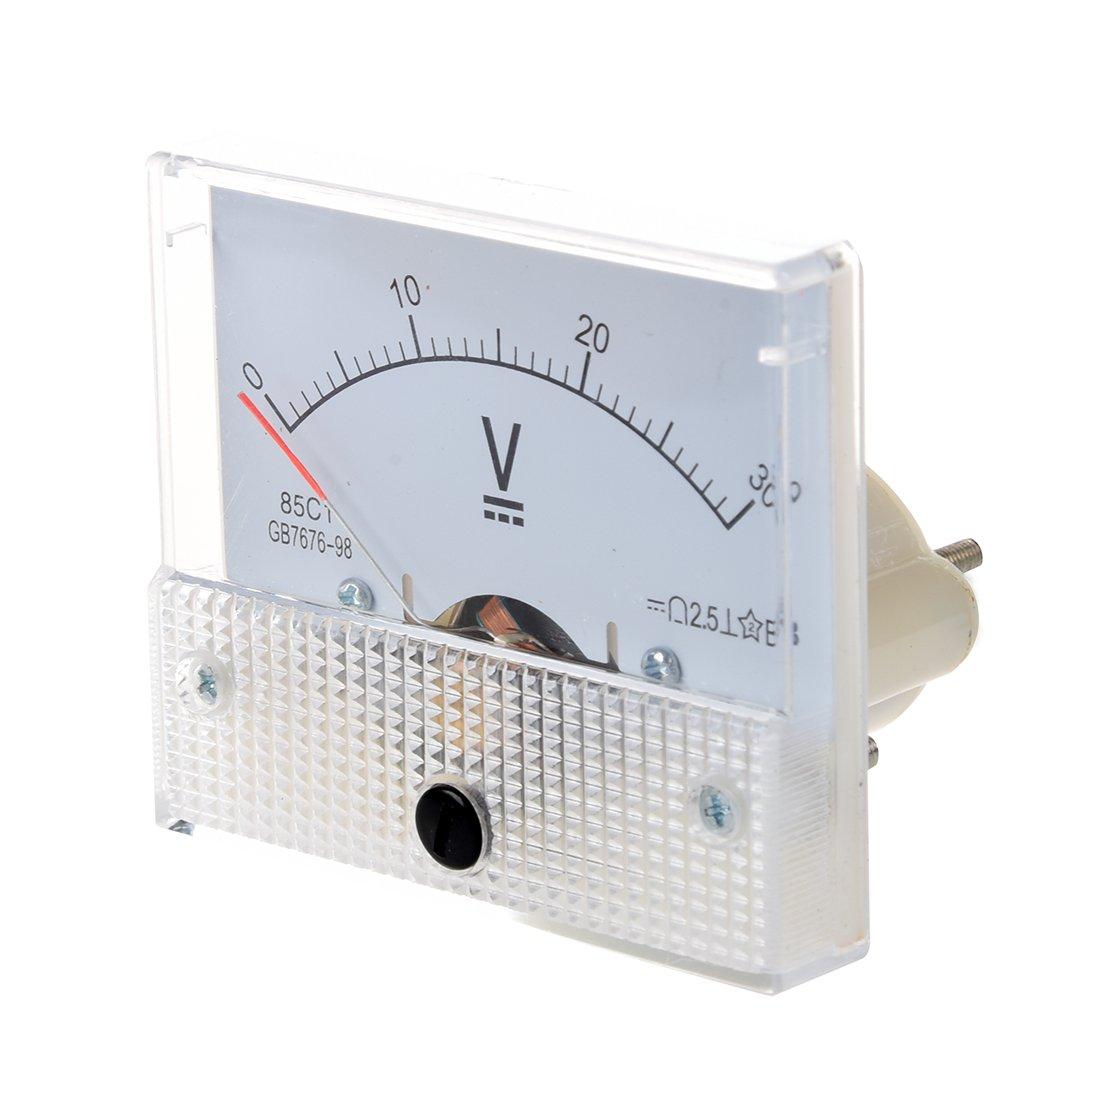 R SODIAL Analogue 30V DC Voltage Needle Panel Meter Voltmeter